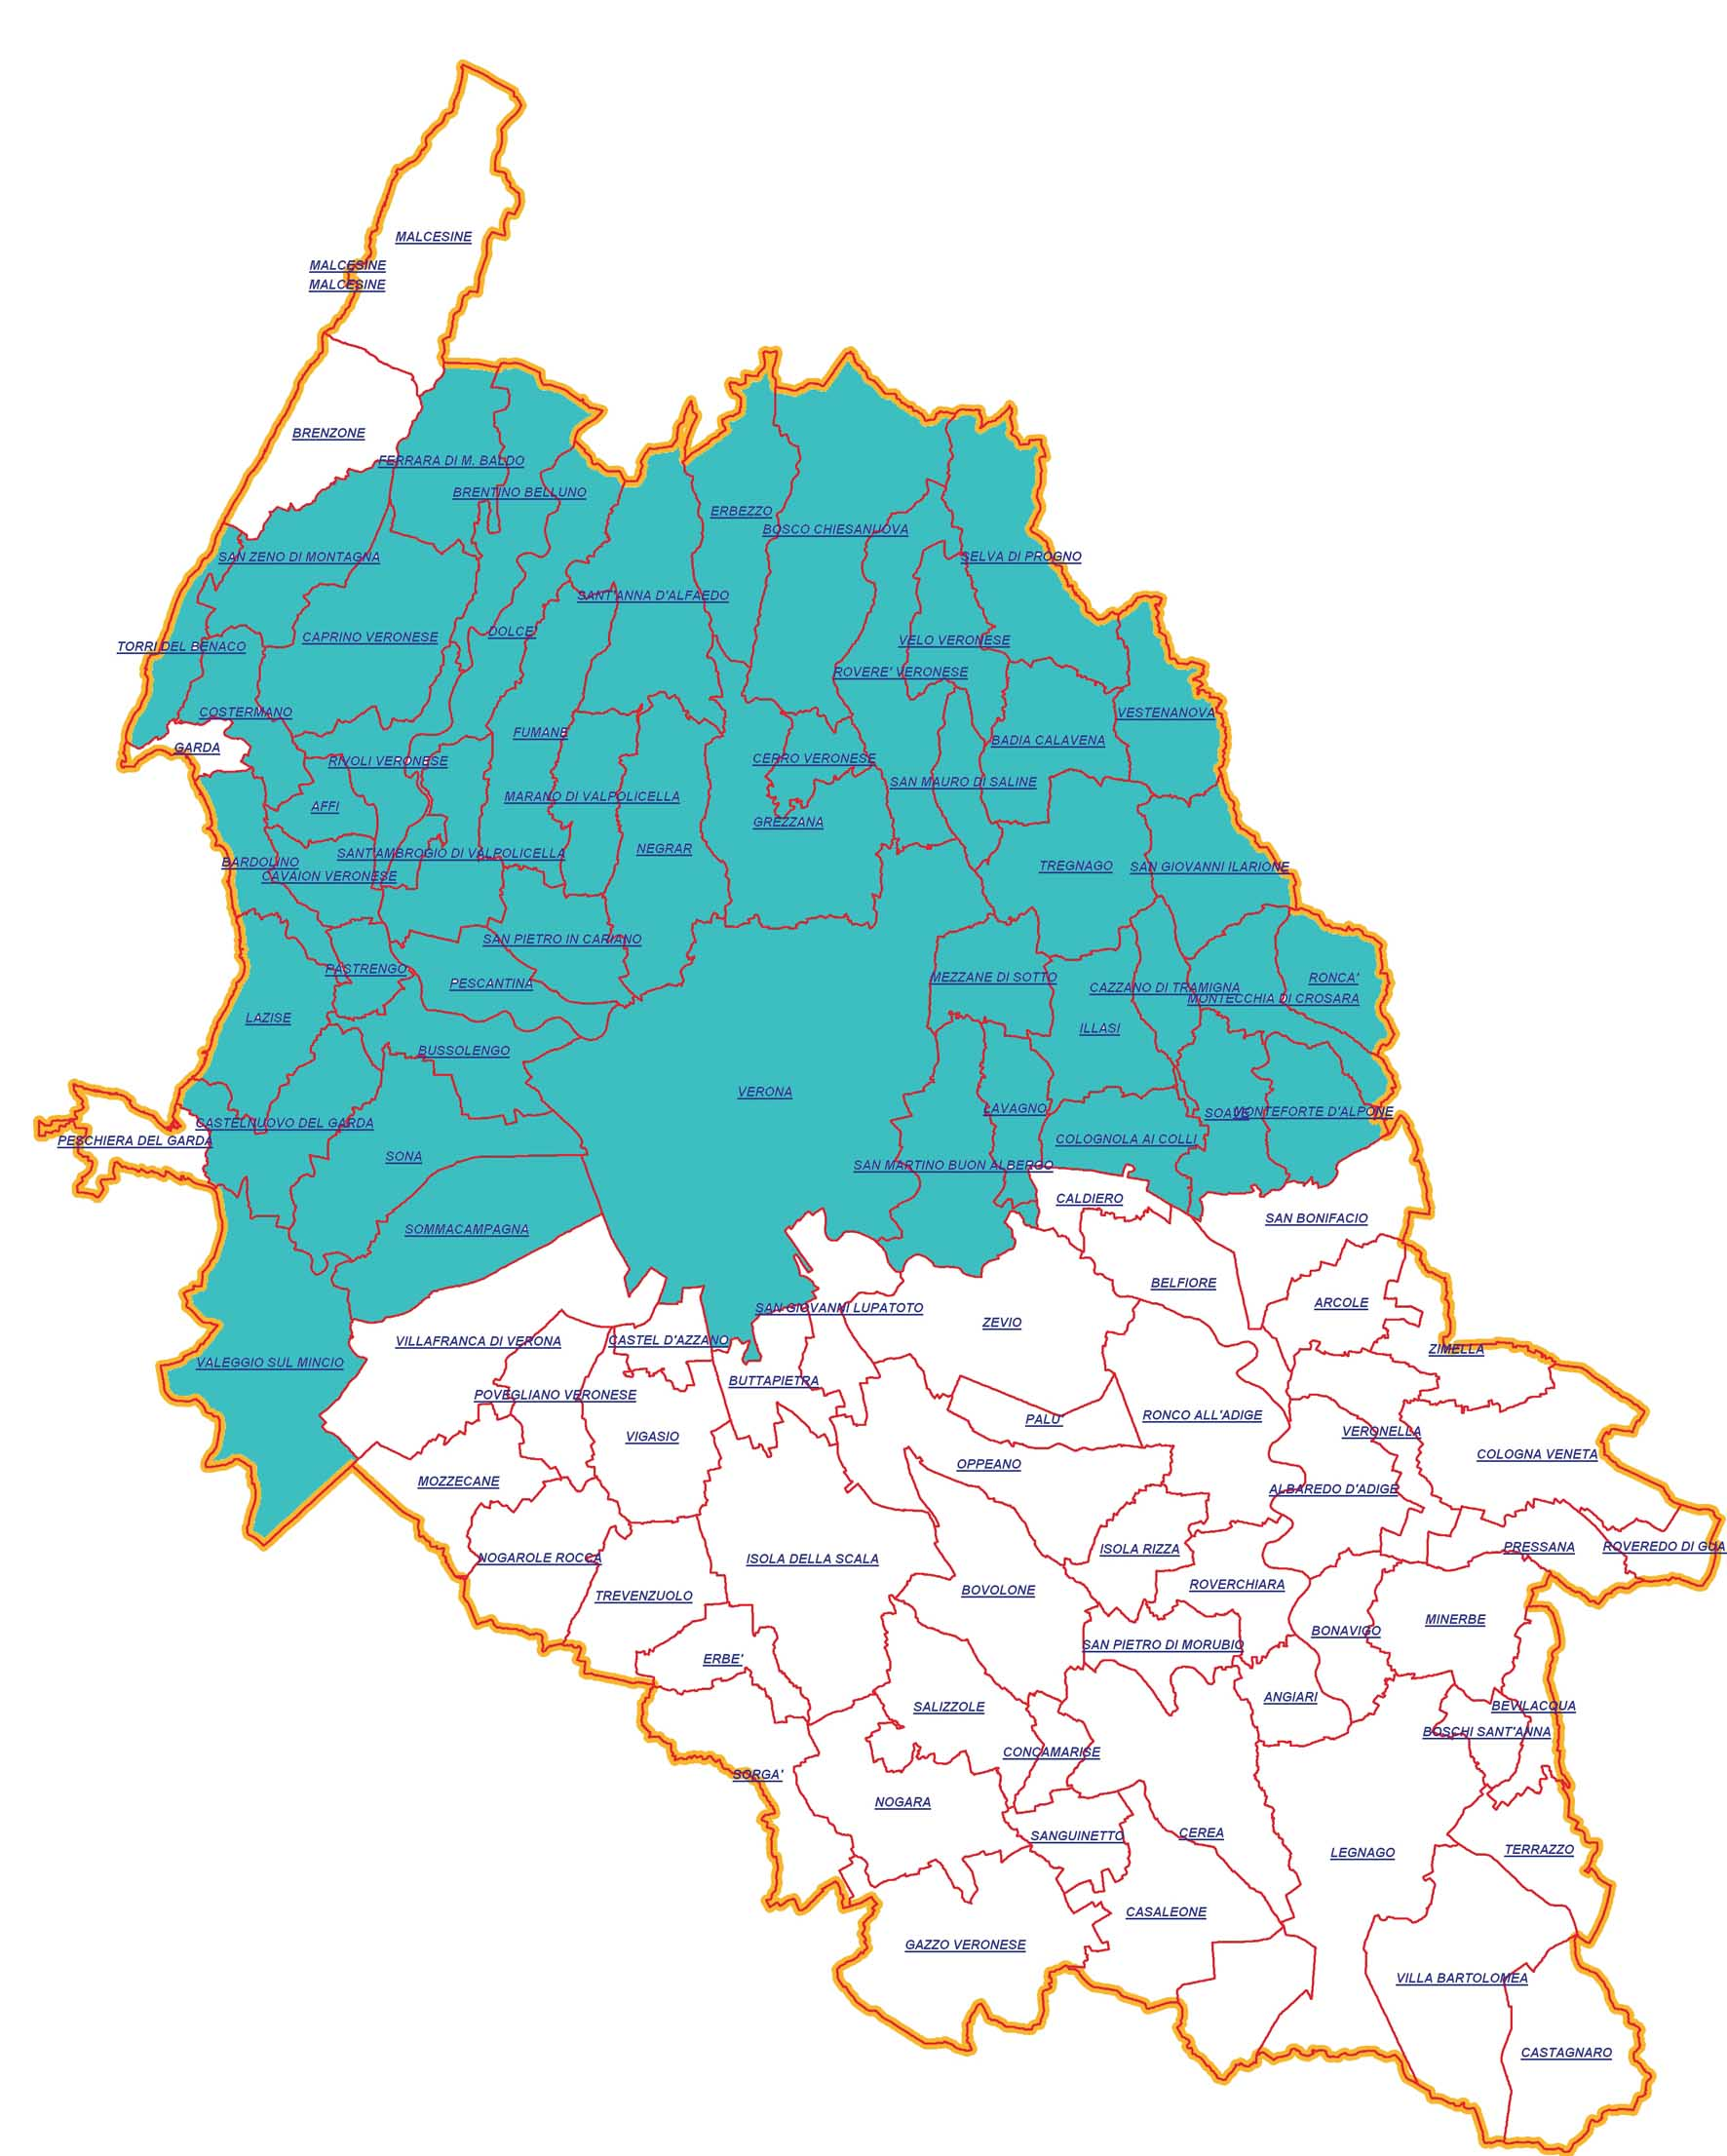 provincia verona ordinanza neve 2013 obbligo catene o pneumatici da neve 1